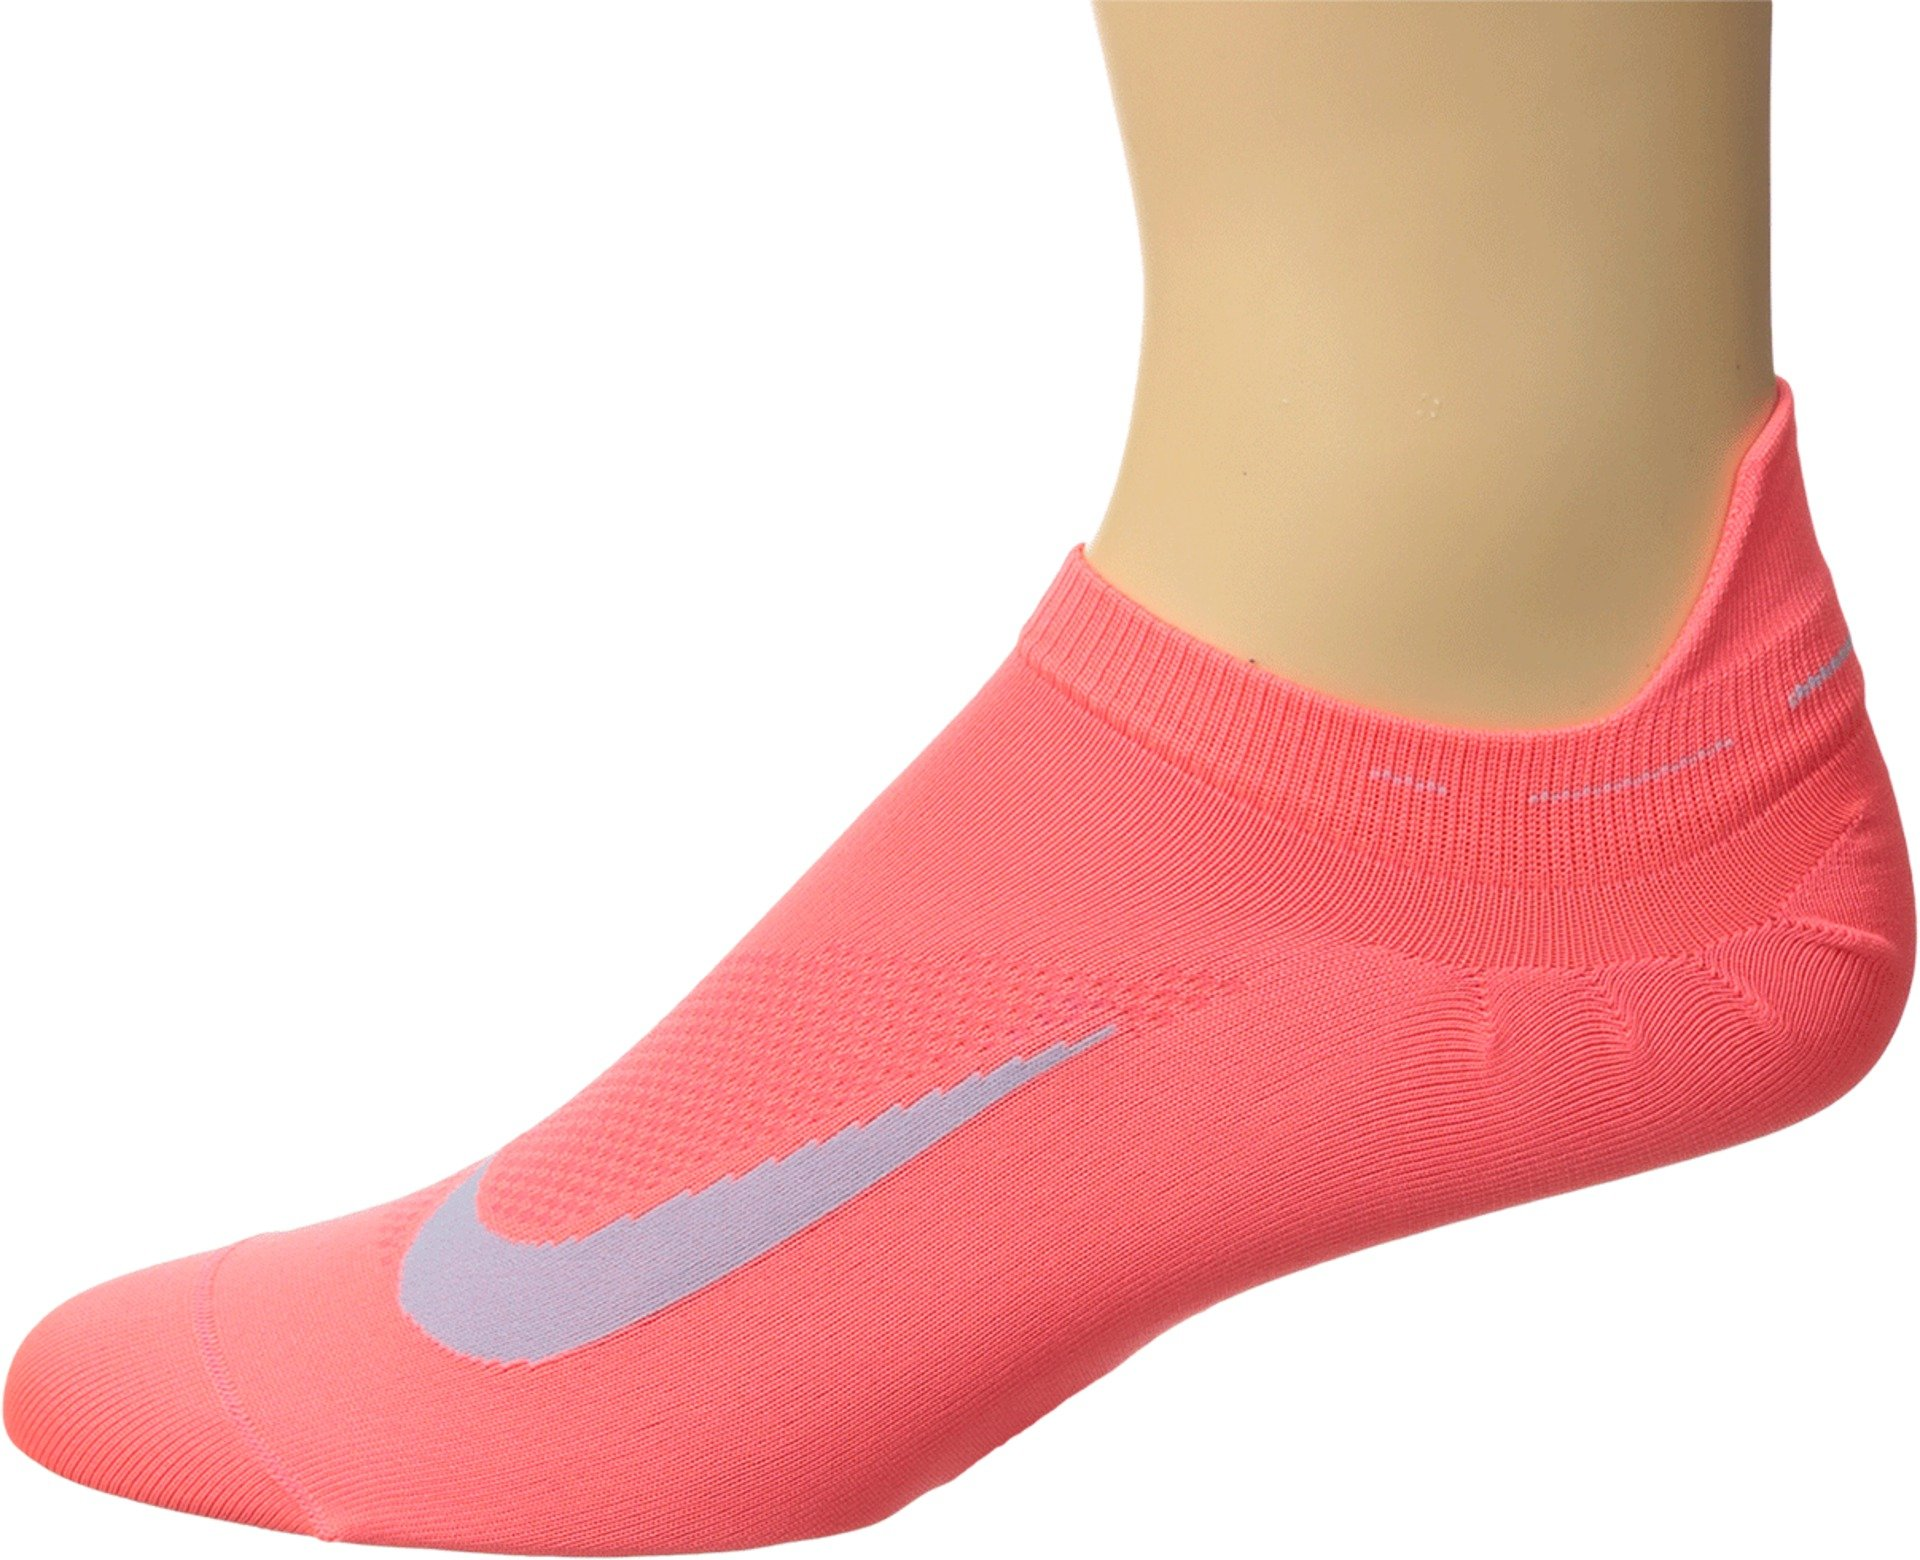 def084755dcc9 Galleon - Nike Men's Elite Lightweight No-Show Tab Running Socks ...